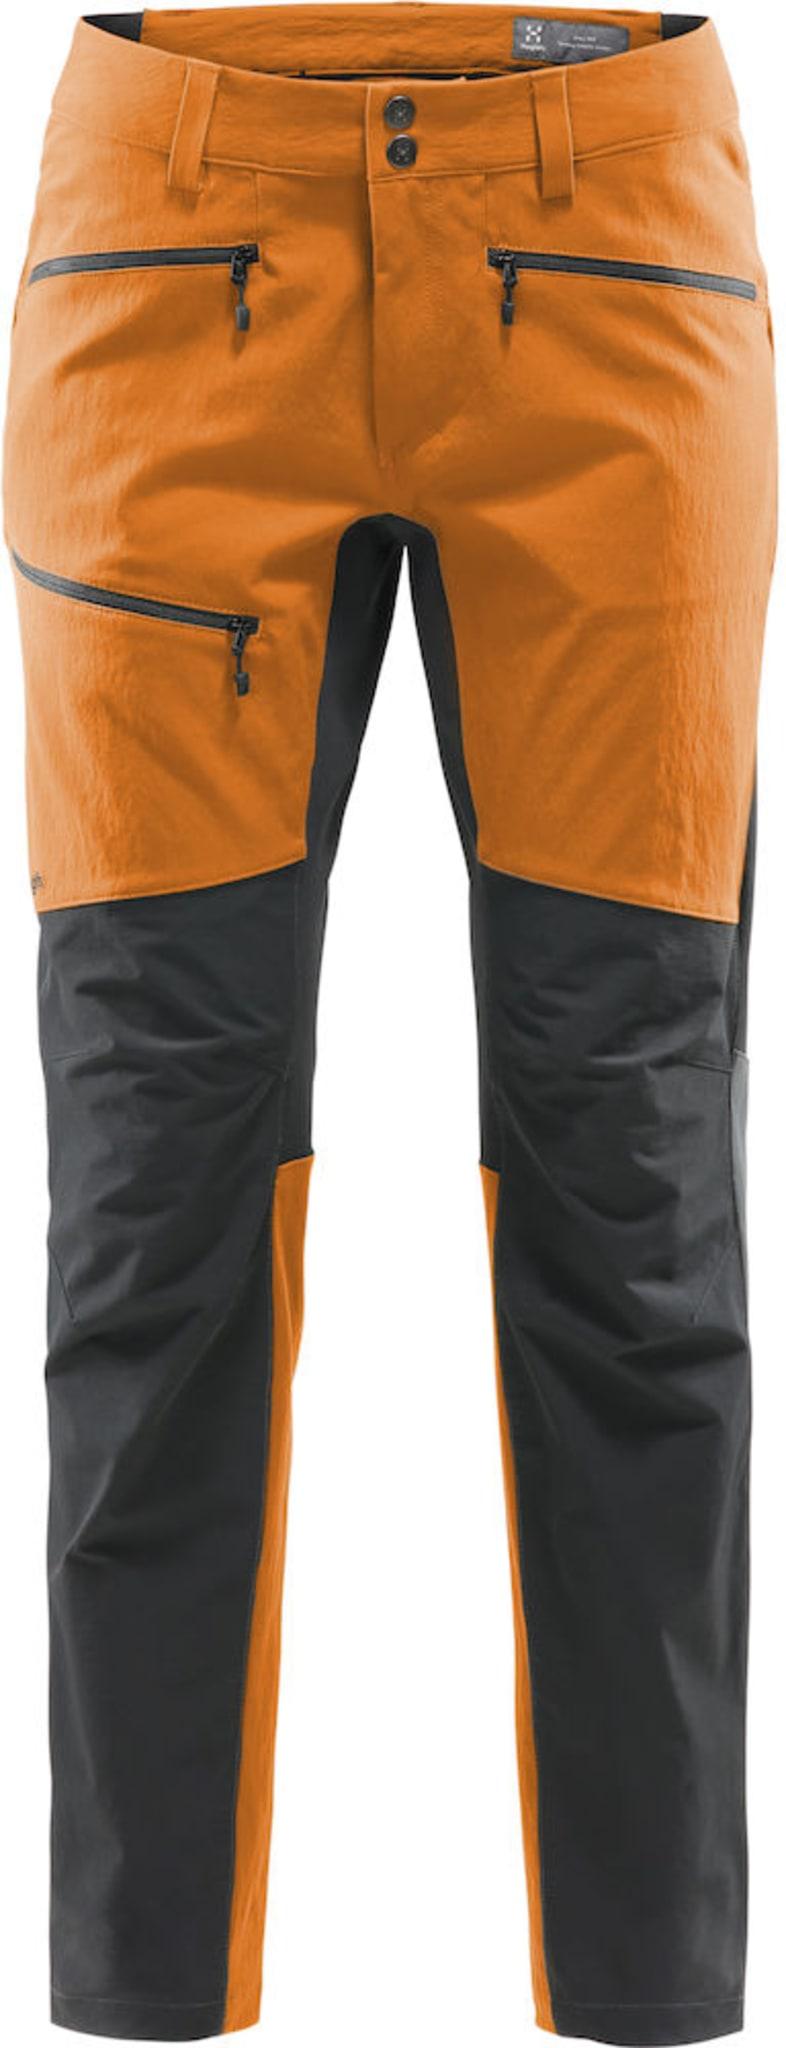 Rugged Flex Pant M